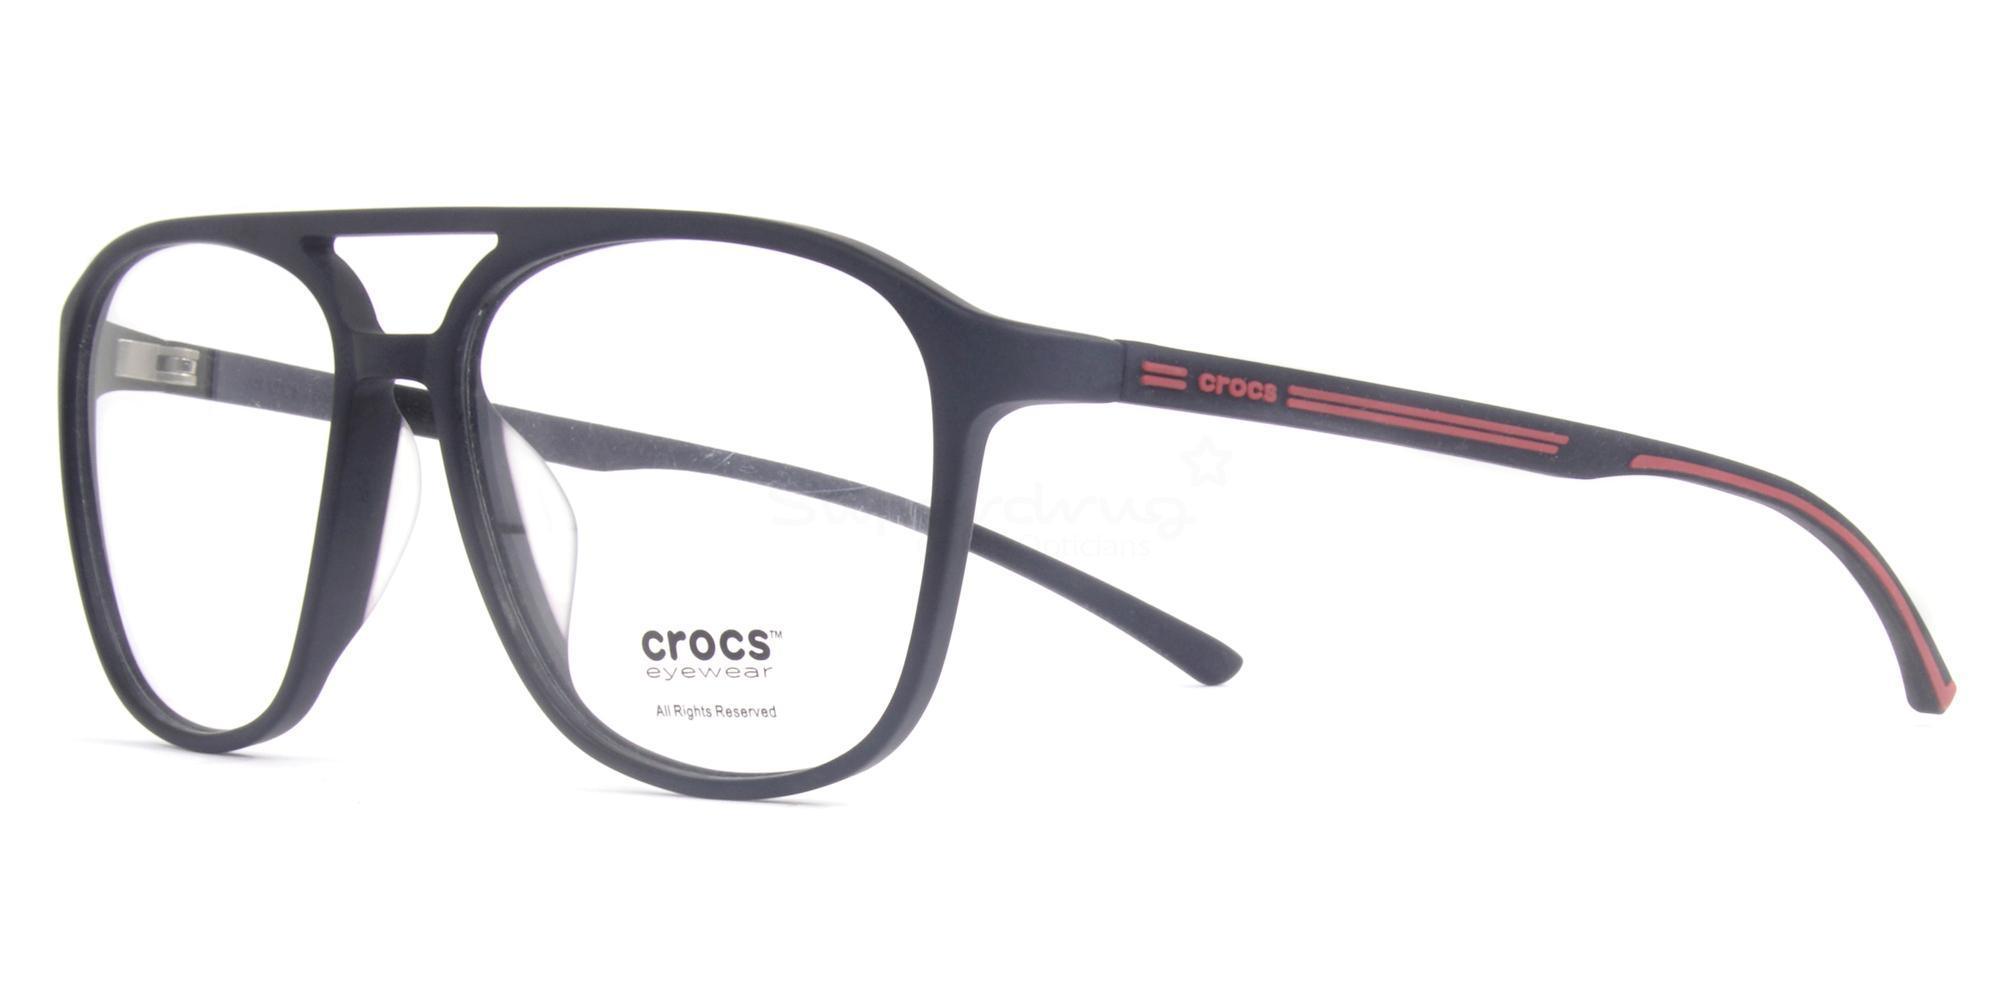 20RD CF3096 Glasses, Crocs Eyewear